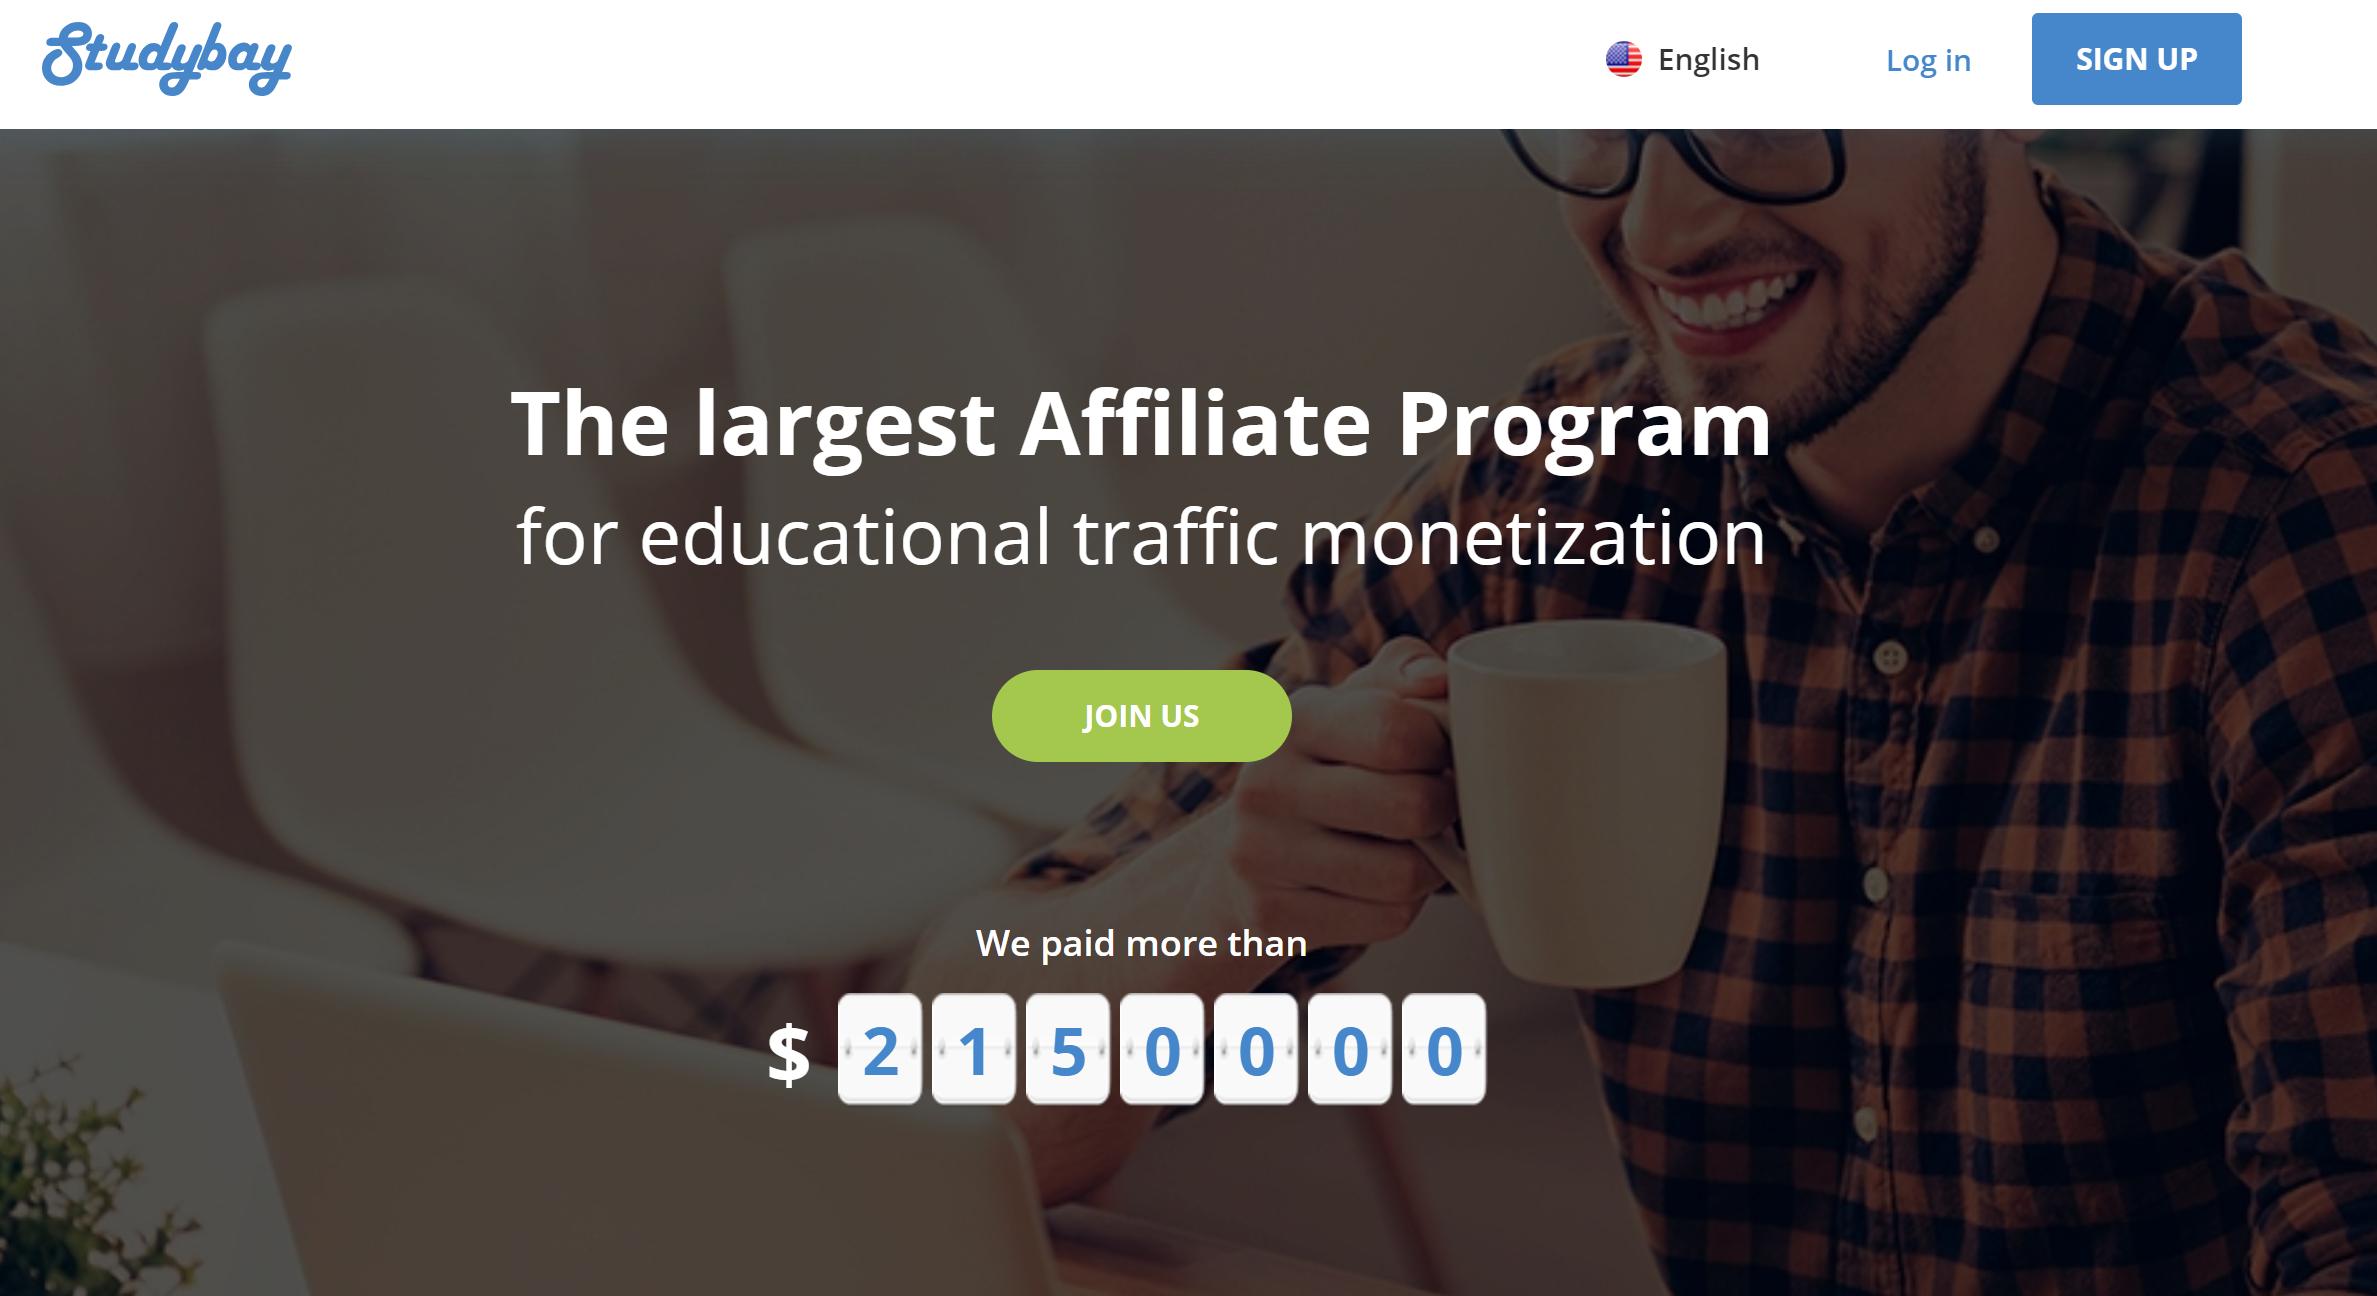 Studybay Affiliate Program